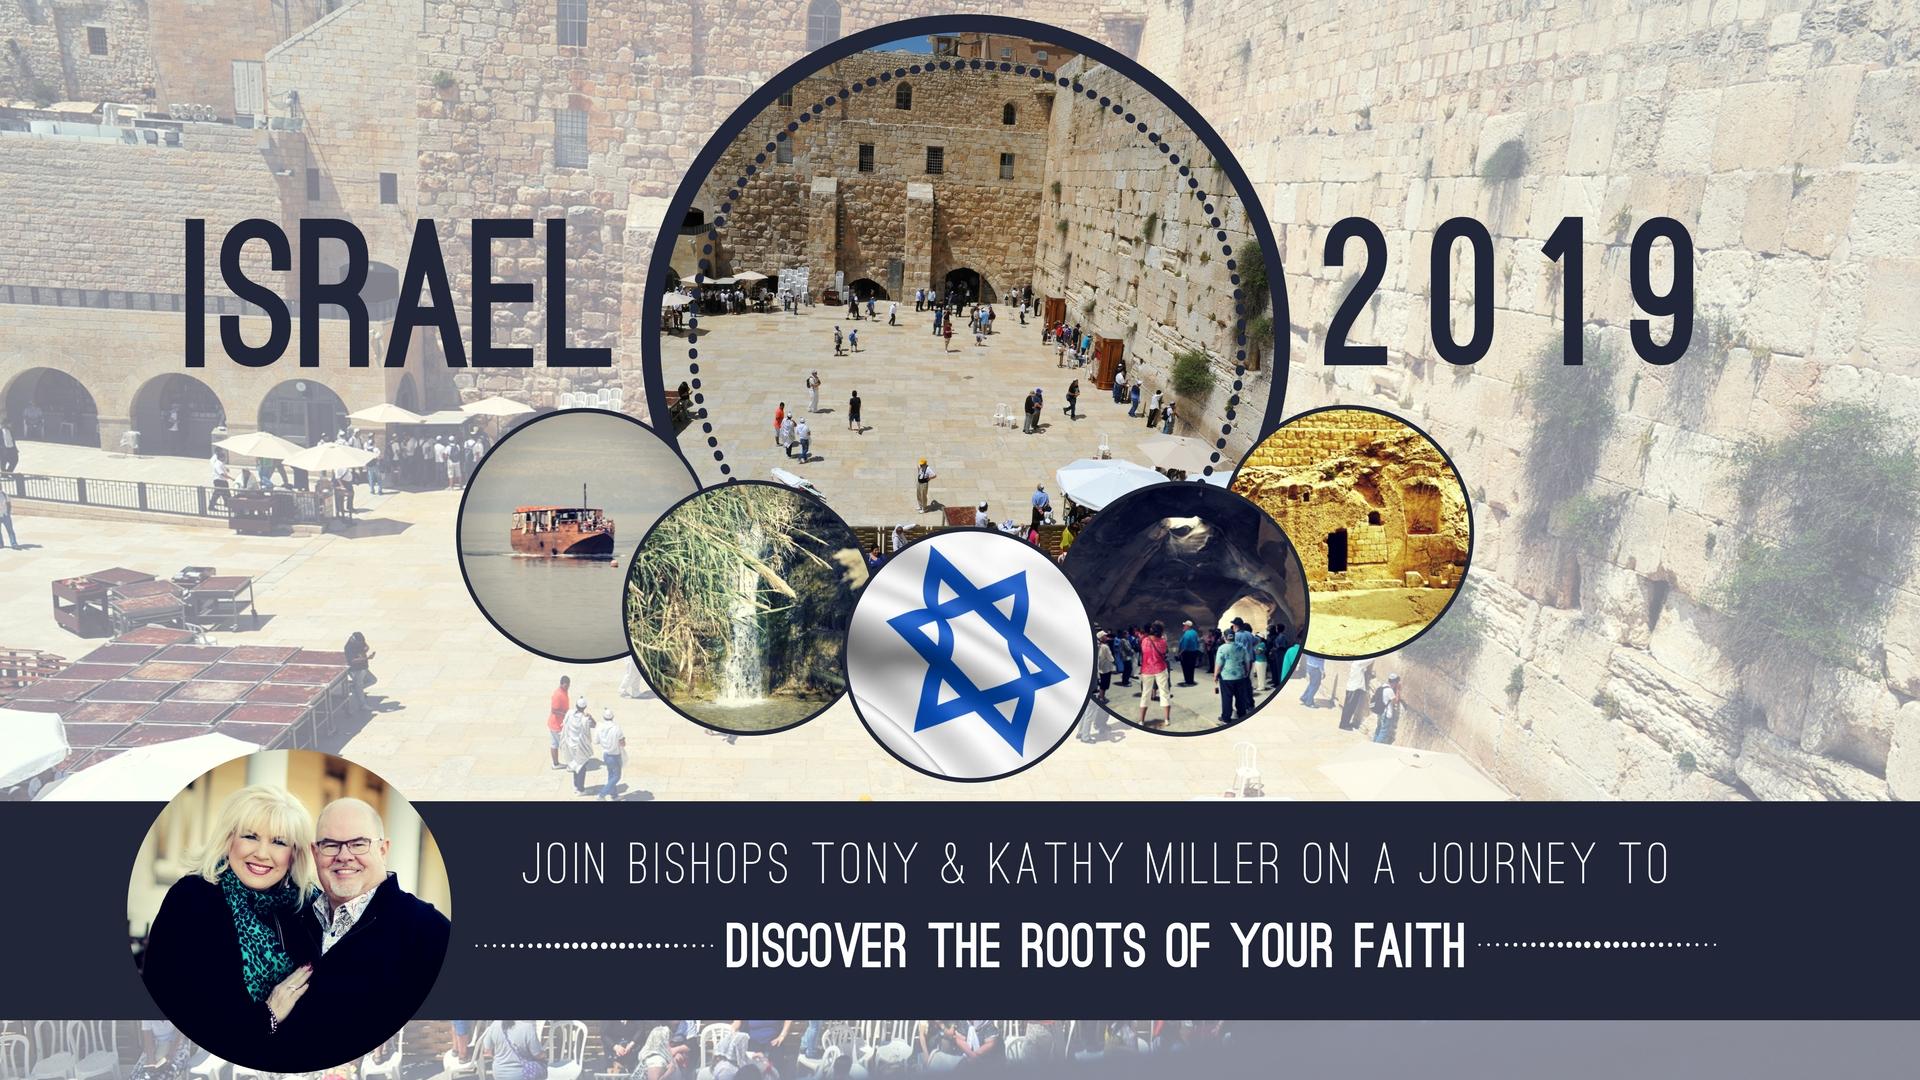 Israel 2019 web 2